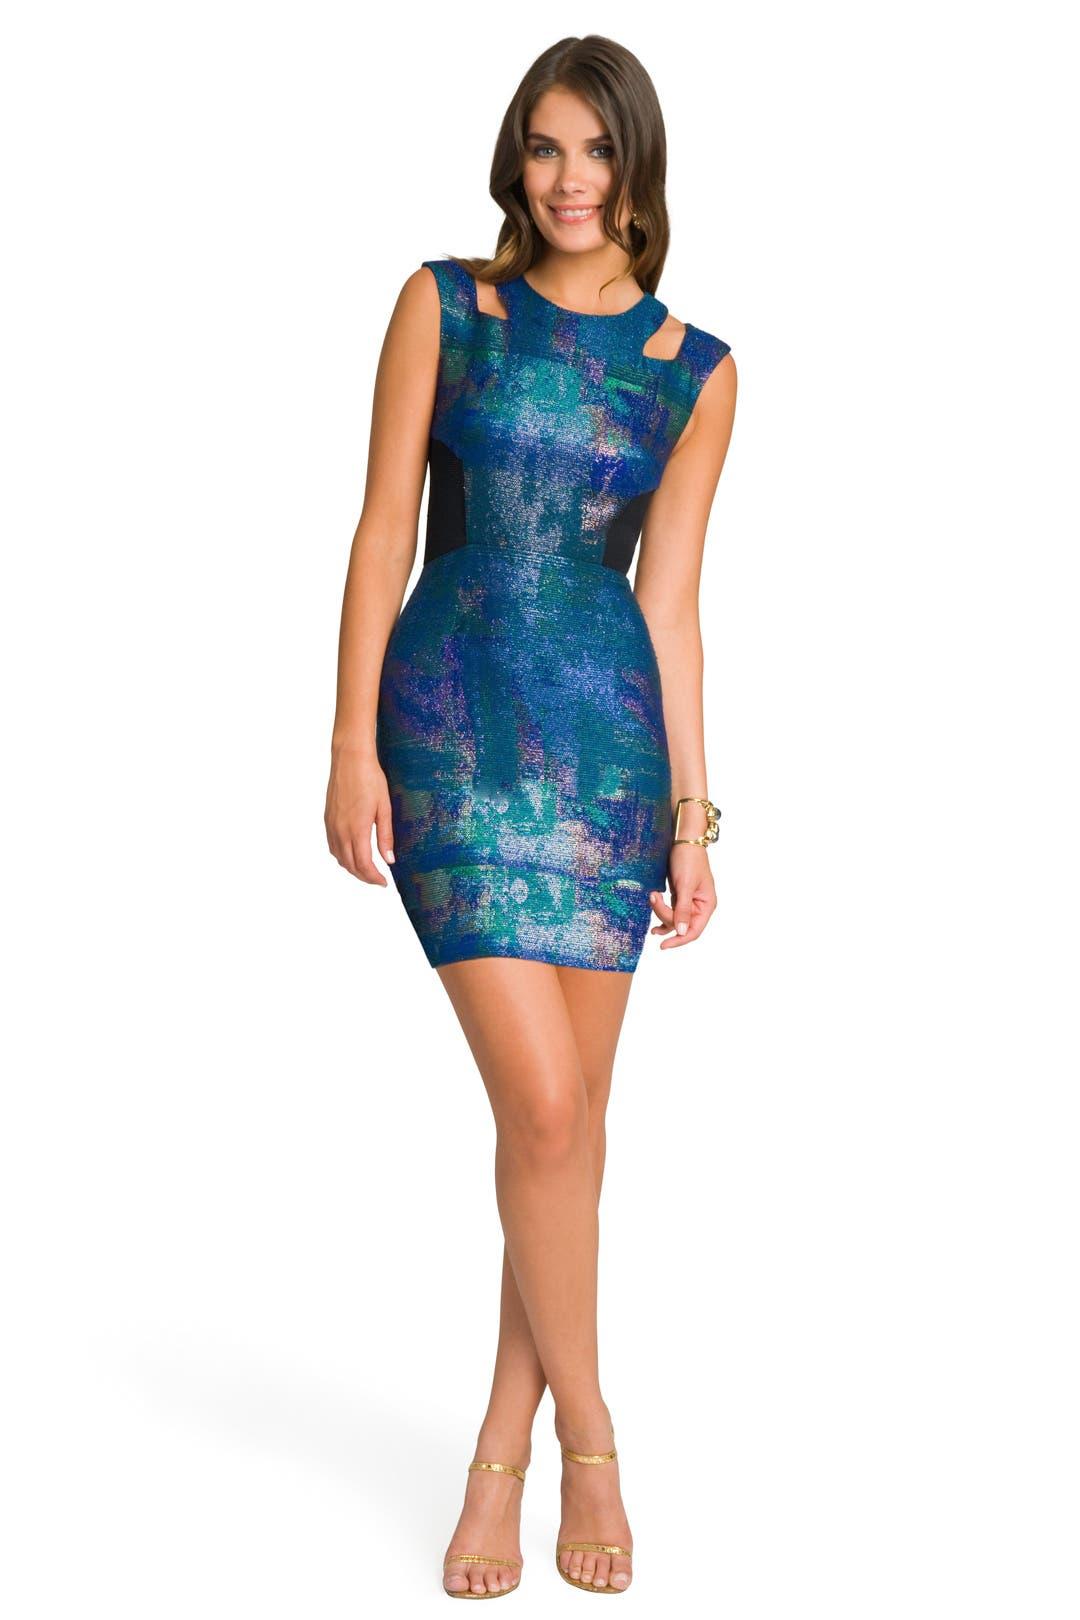 Kaleidoscope Cut Out Dress by Proenza Schouler